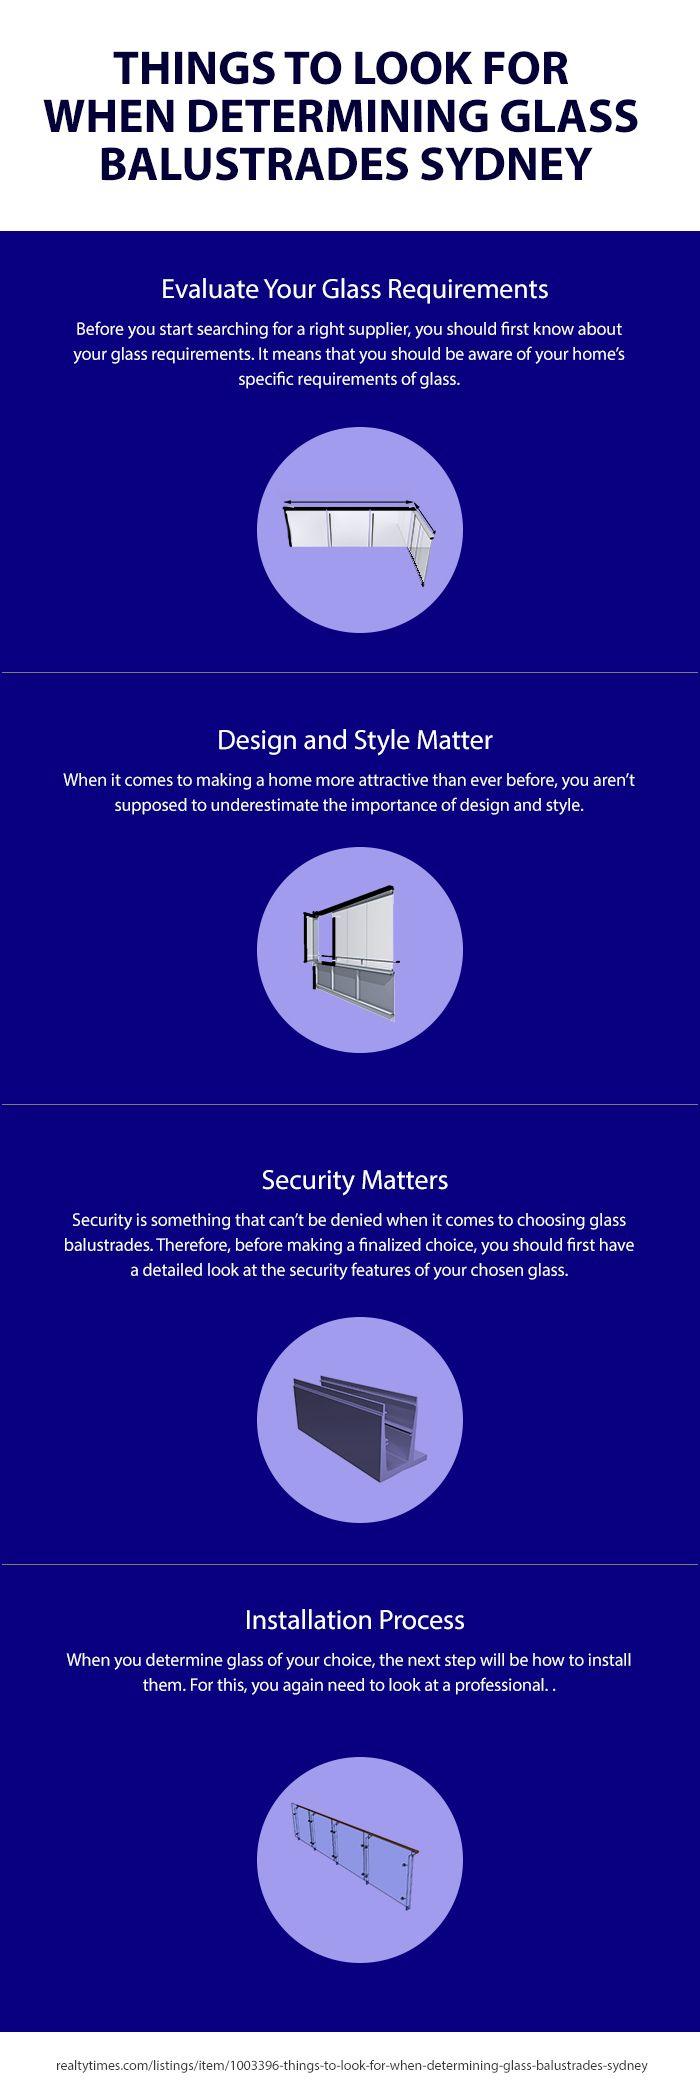 We supply, design, build and install Glass Balustrade, frameless balustrade systems in homes across Australia.